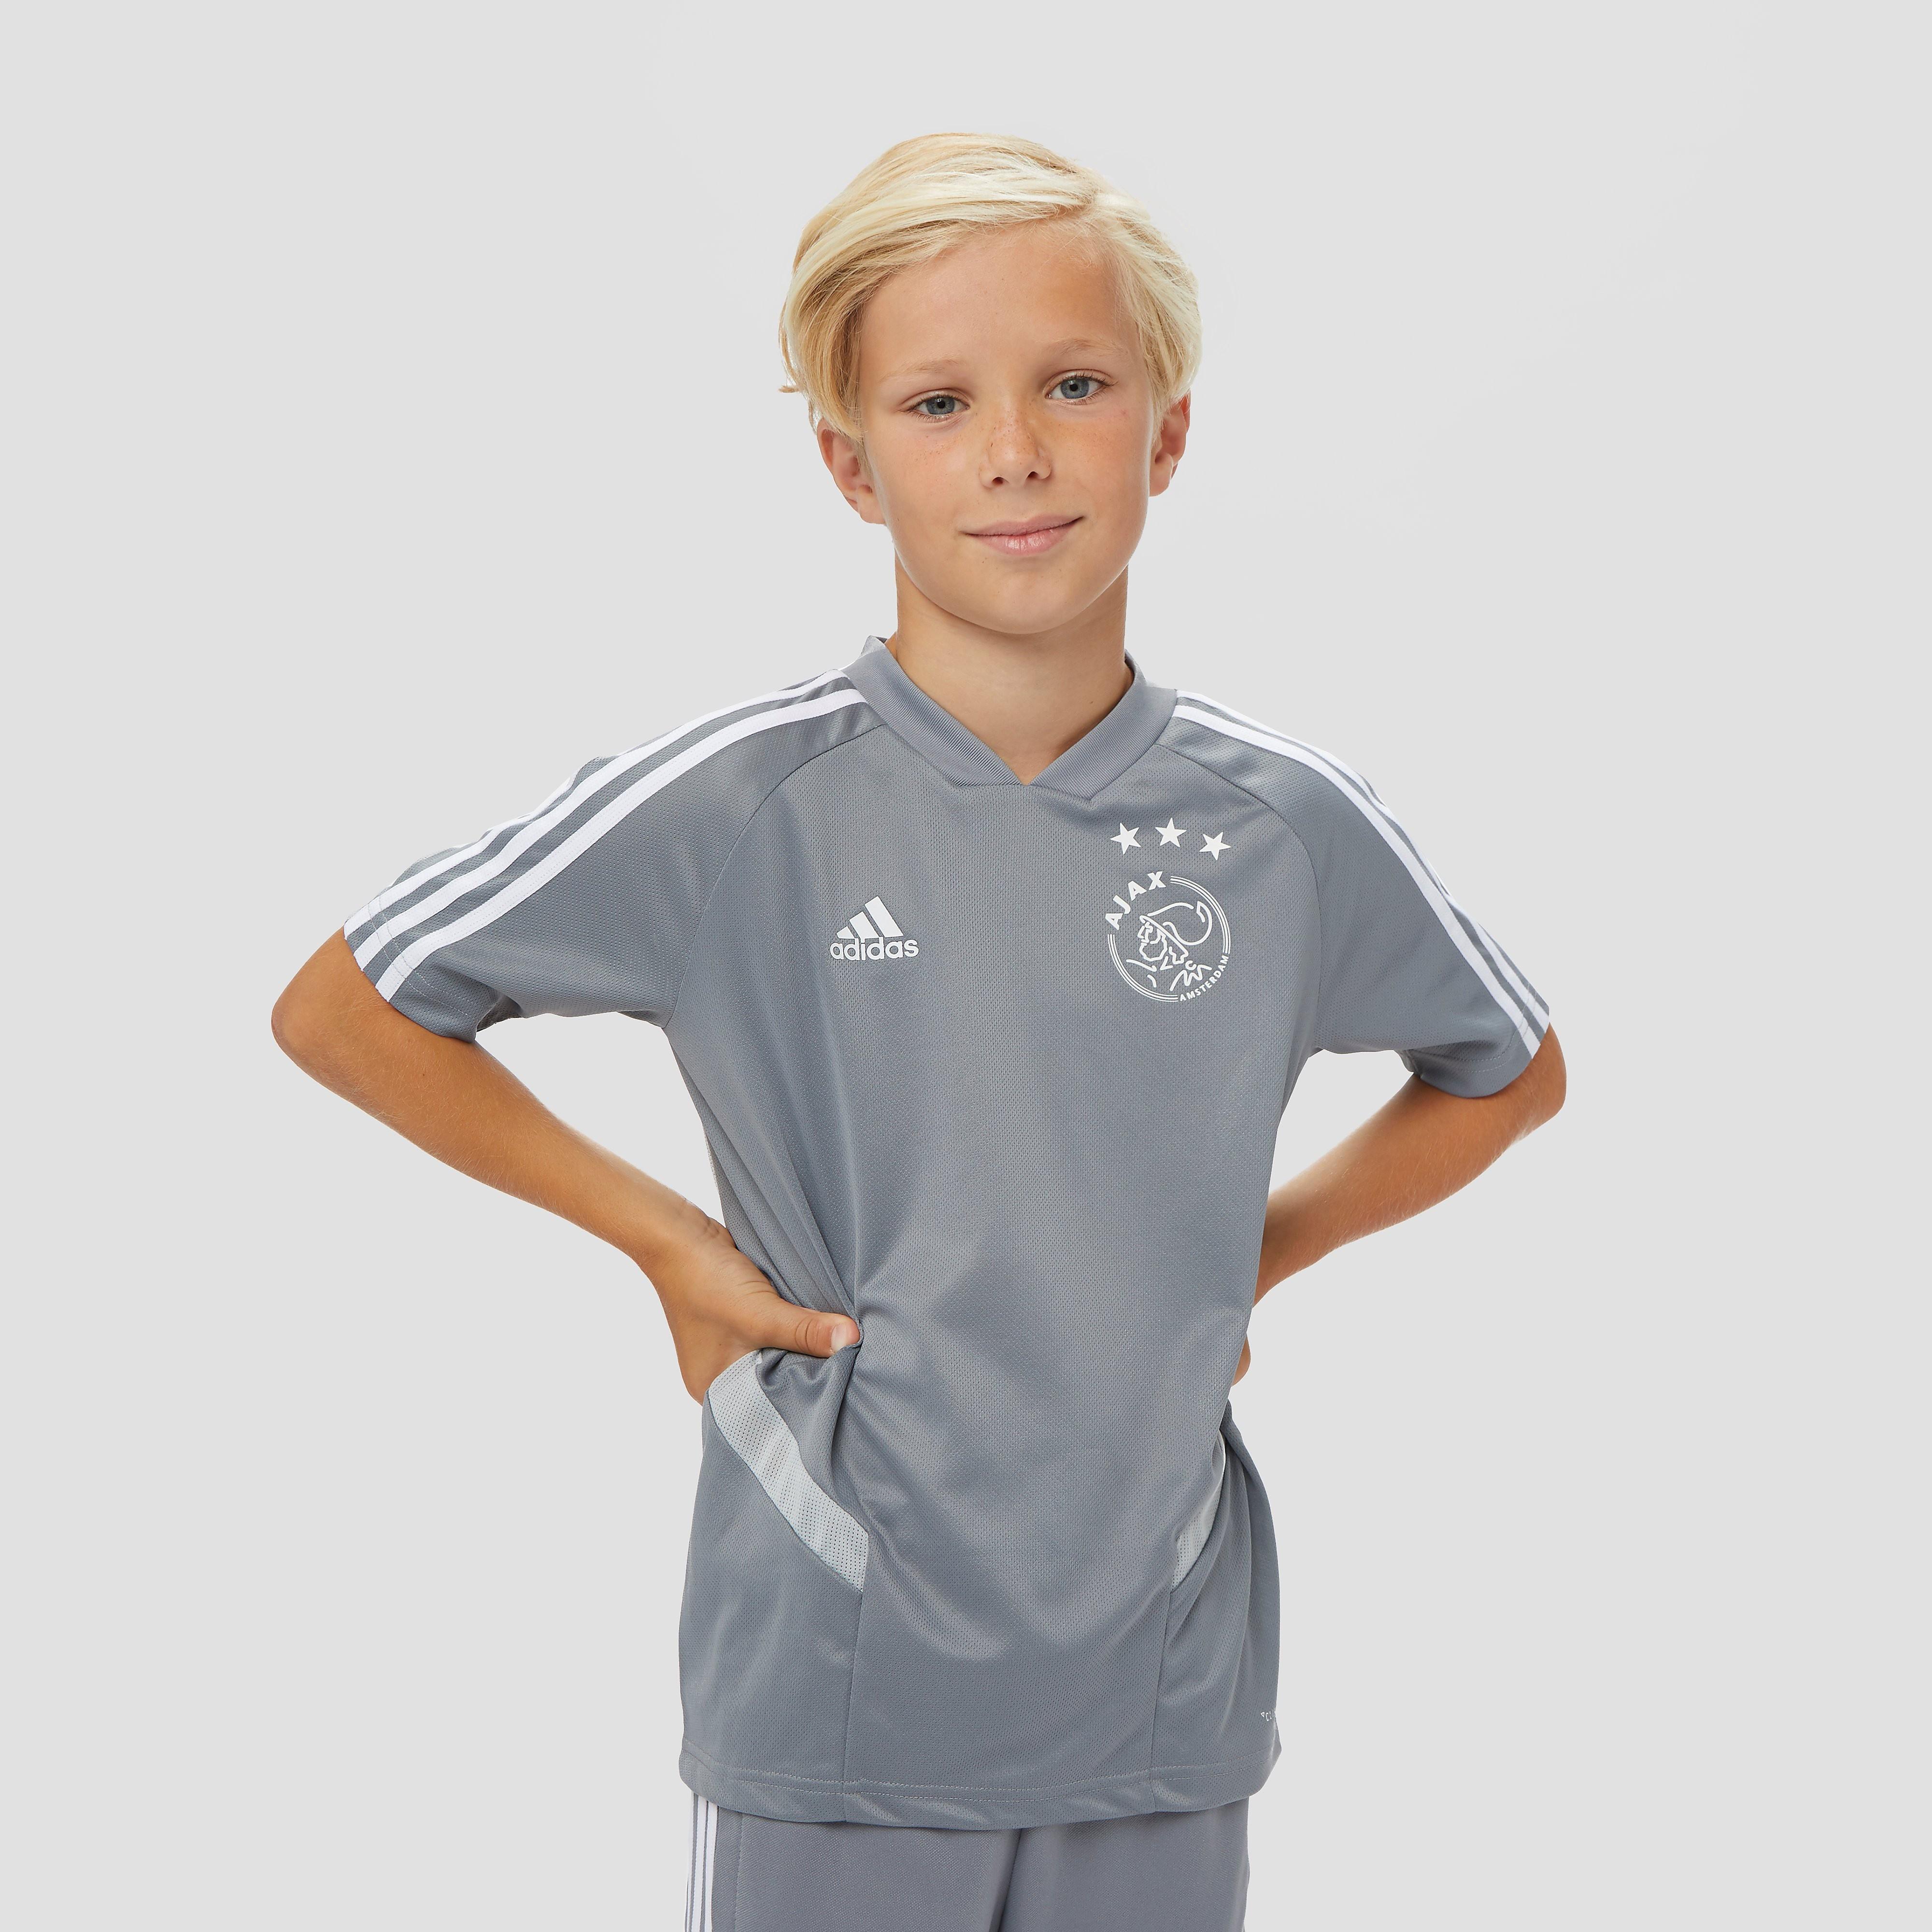 adidas Afc ajax warming-up trainingsshirt 19/20 grijs kinderen Kinderen